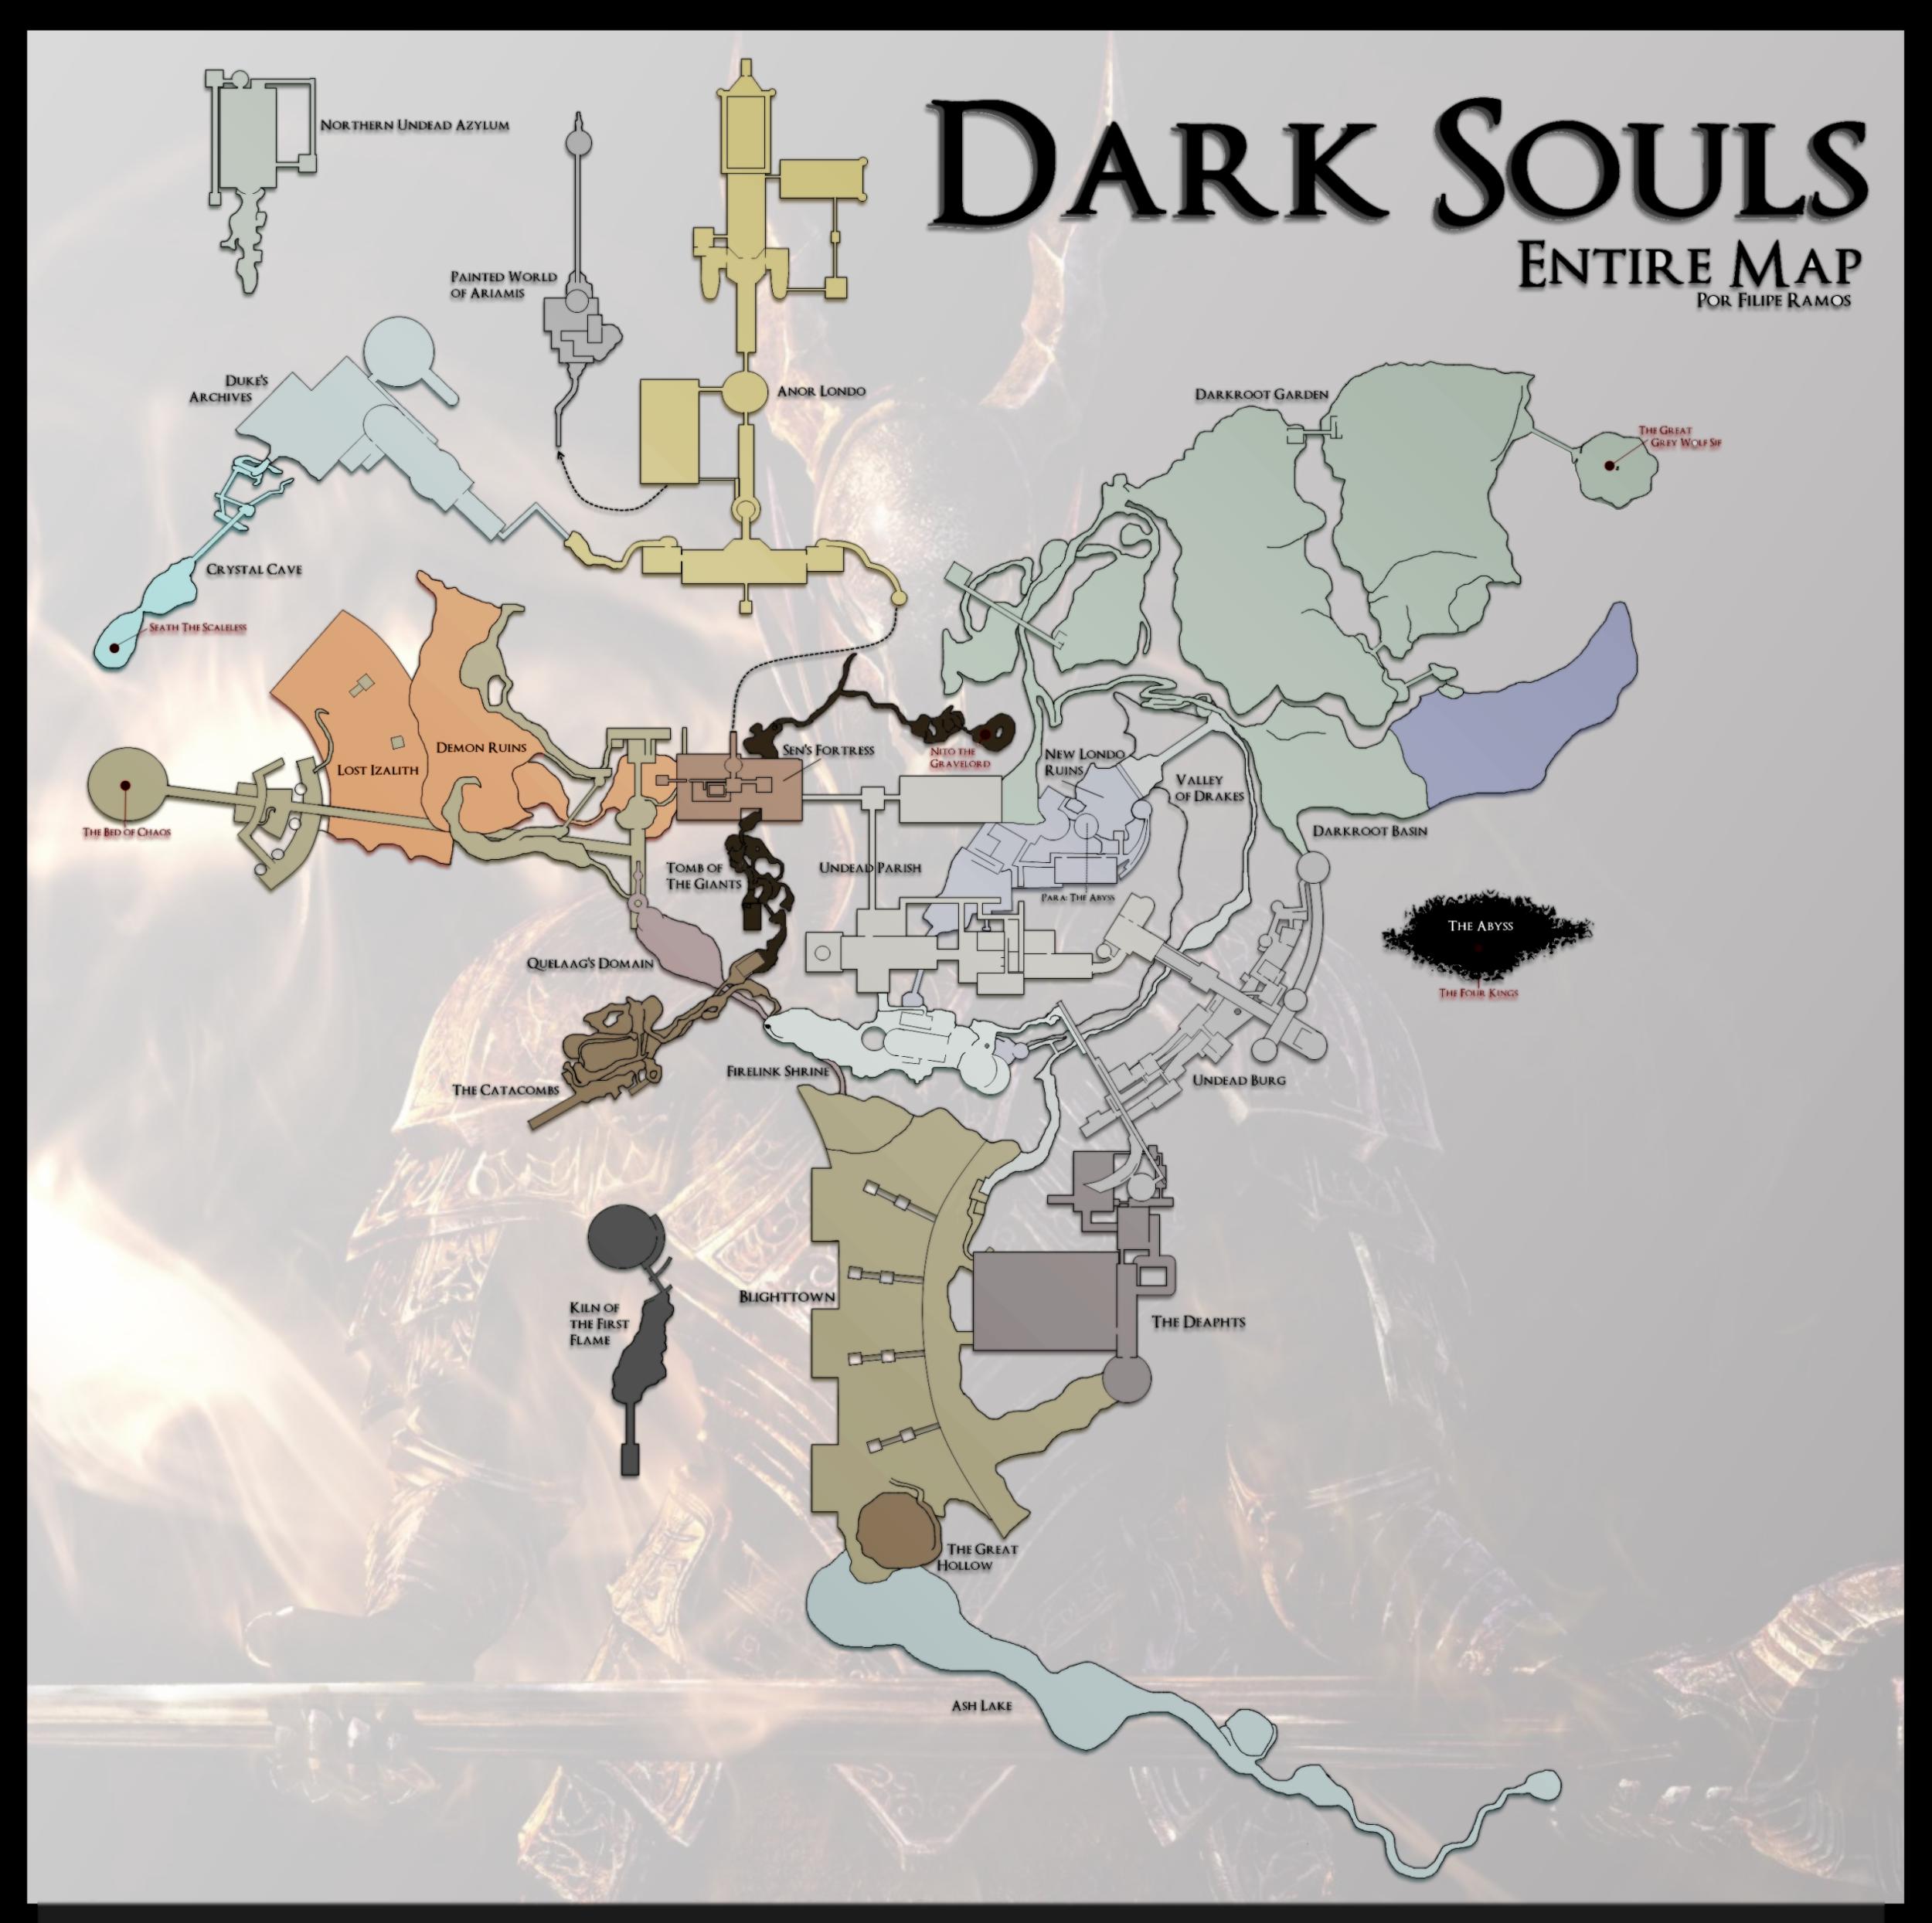 Dark Souls World Map Steam Community :: :: Dark Souls World Map Dark Souls World Map